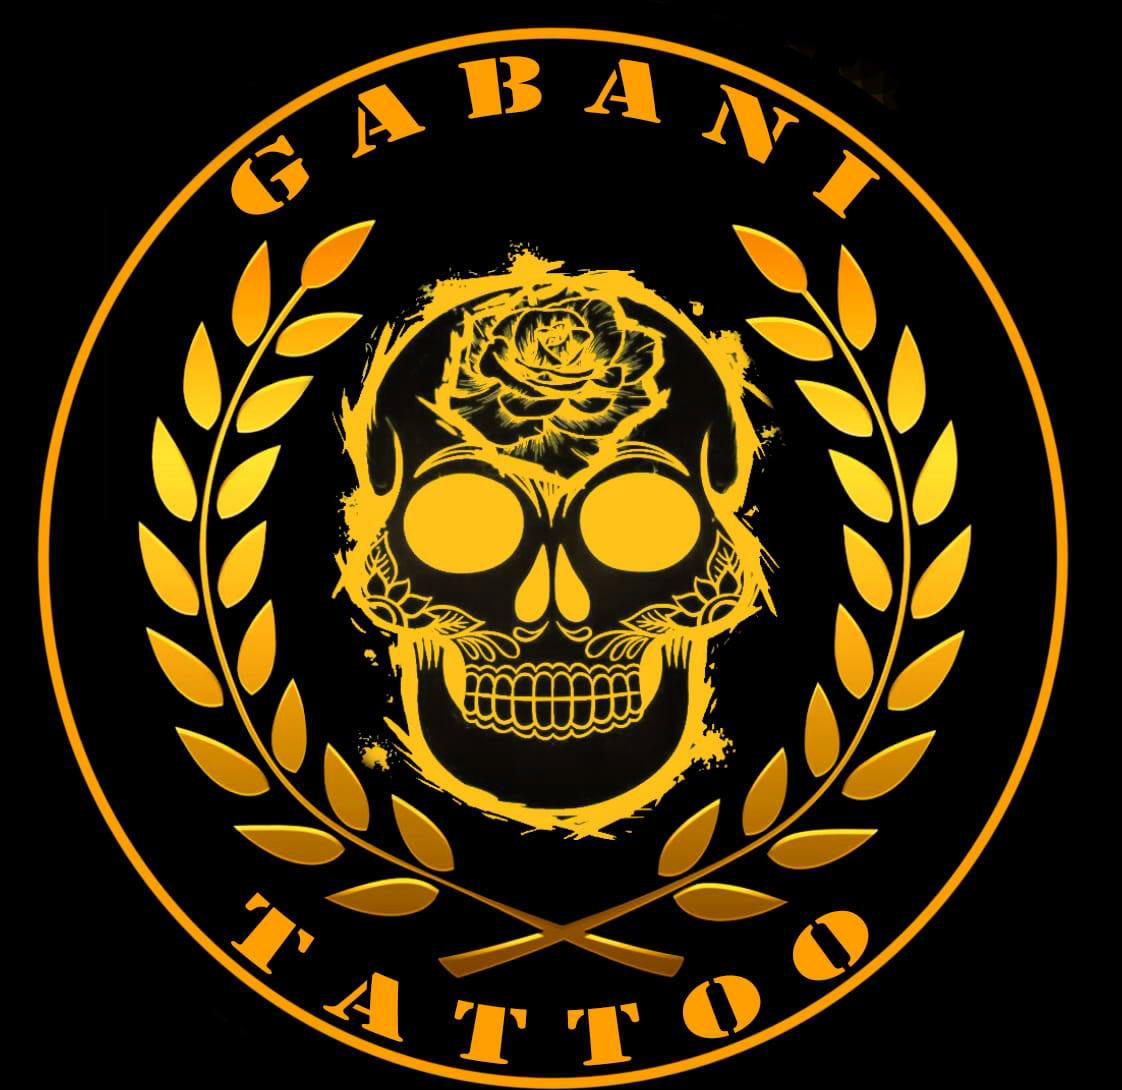 Gabor Gabani